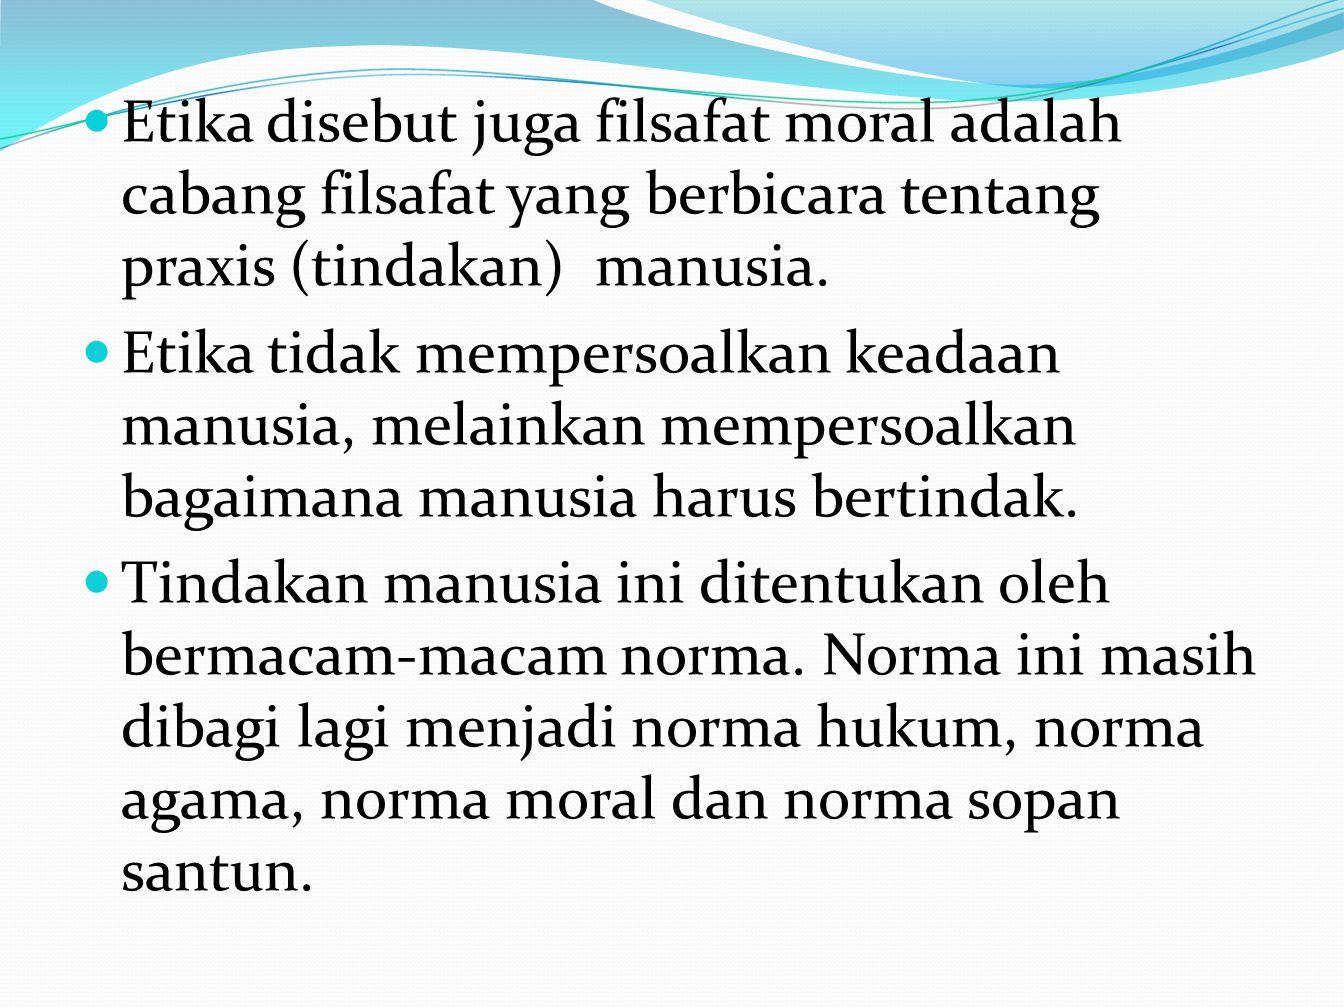 Etika disebut juga filsafat moral adalah cabang filsafat yang berbicara tentang praxis (tindakan) manusia. Etika tidak mempersoalkan keadaan manusia,